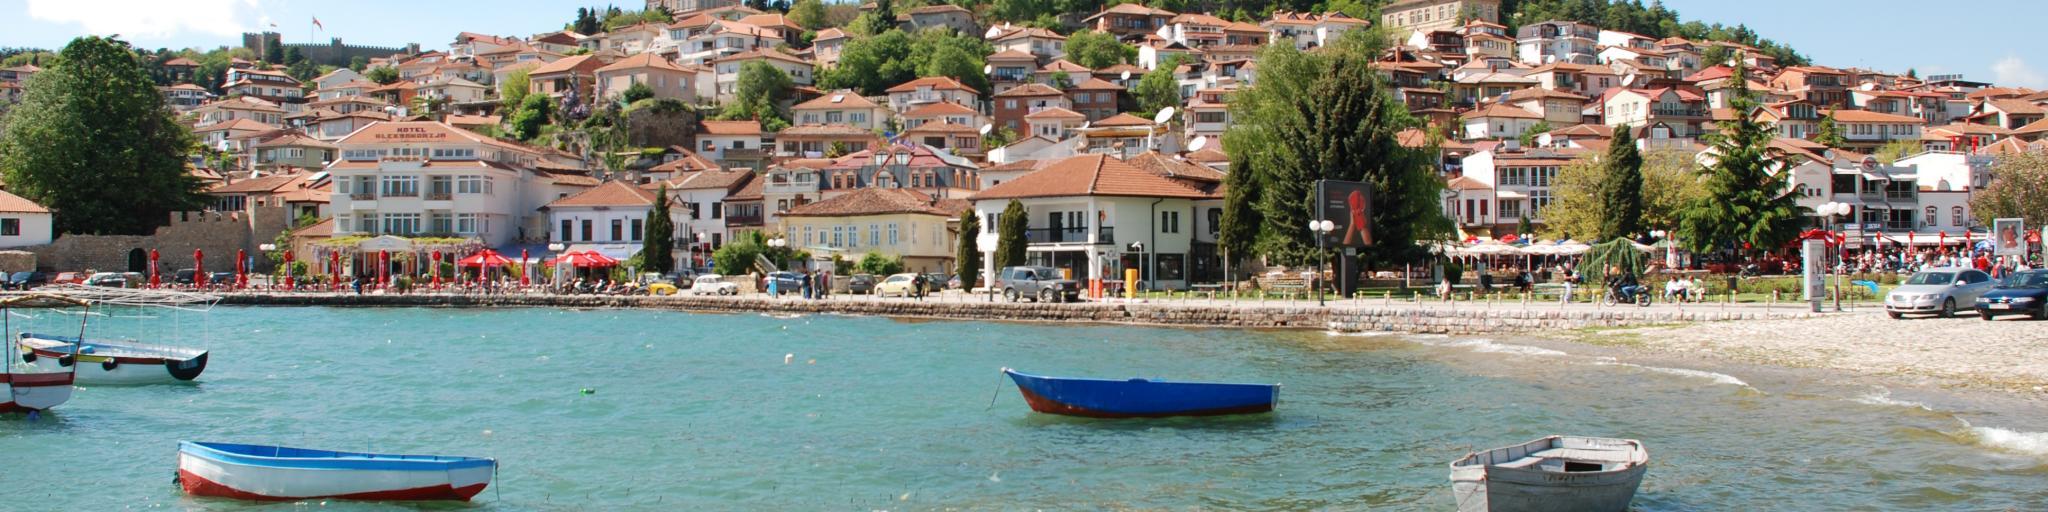 Wooden boats float on Lake Ohrid